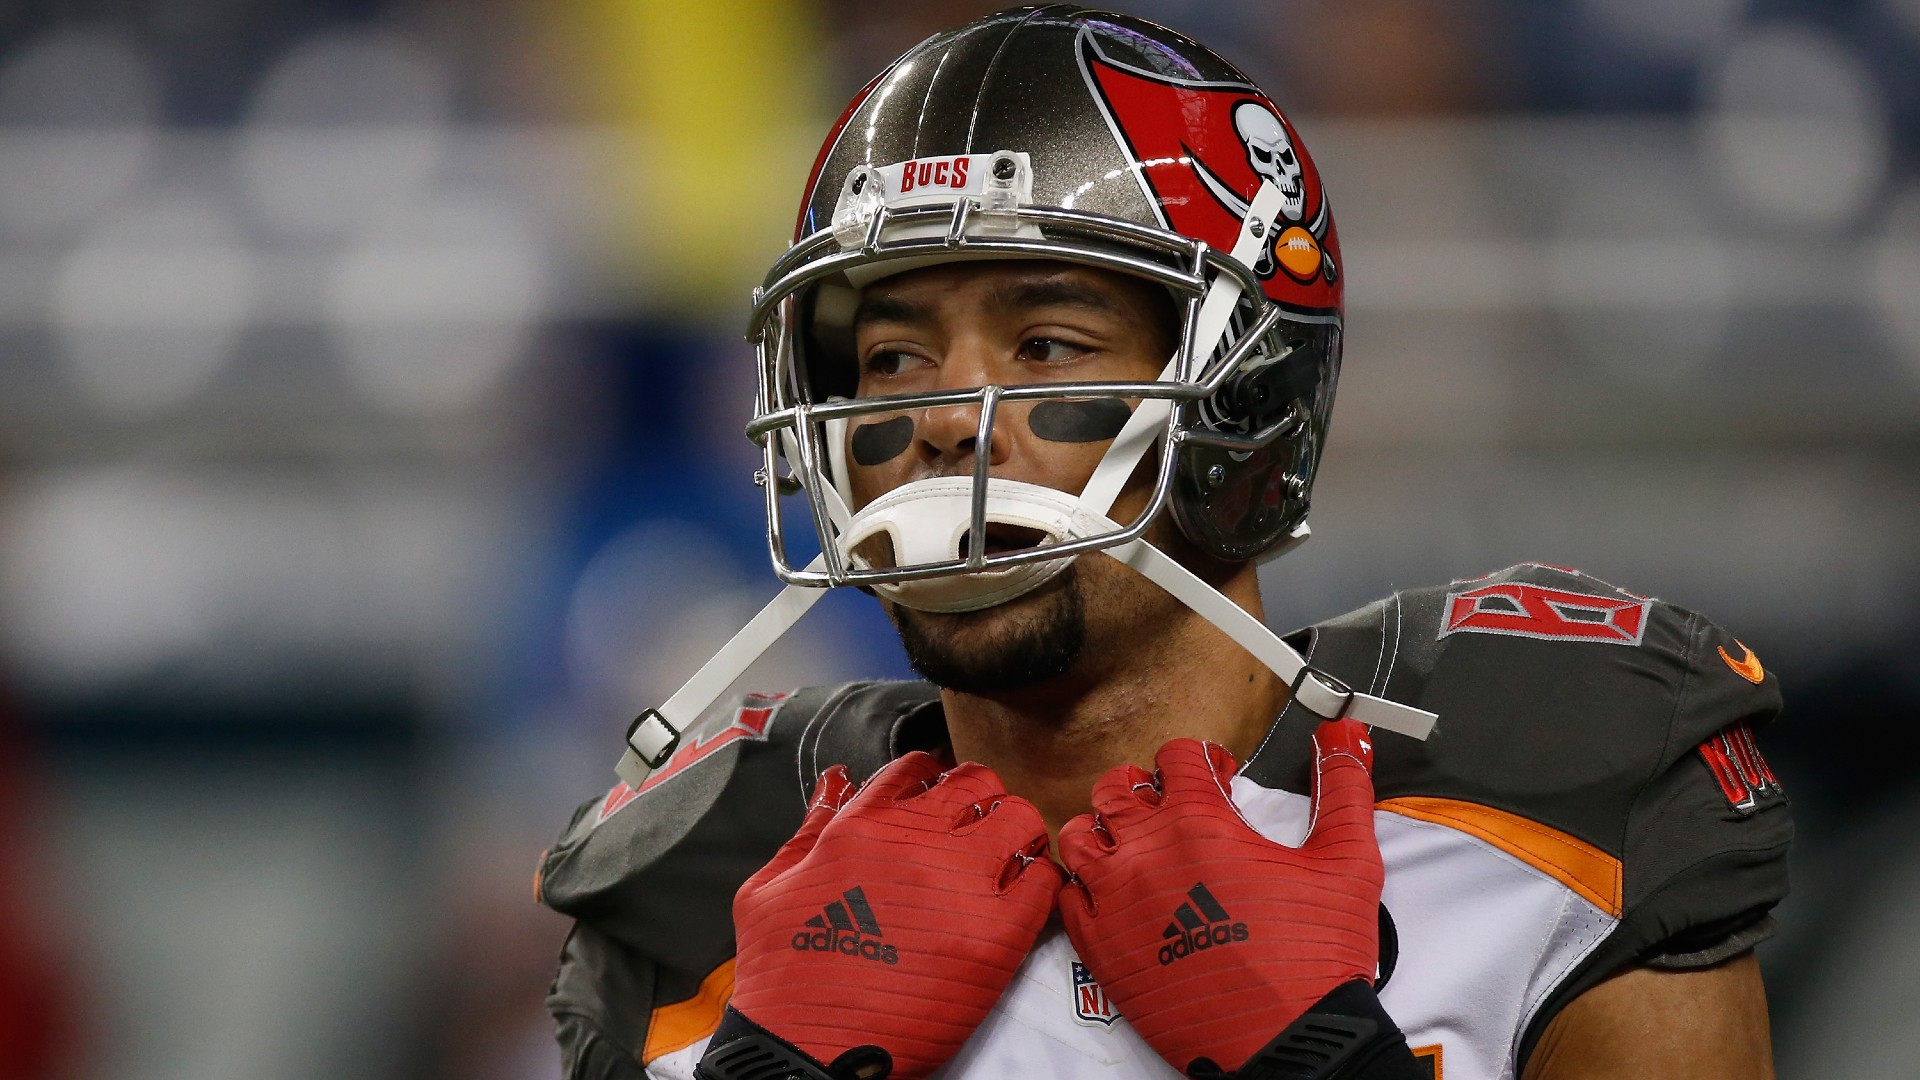 Ex-NFL wide receiver Vincent Jackson found dead at 38